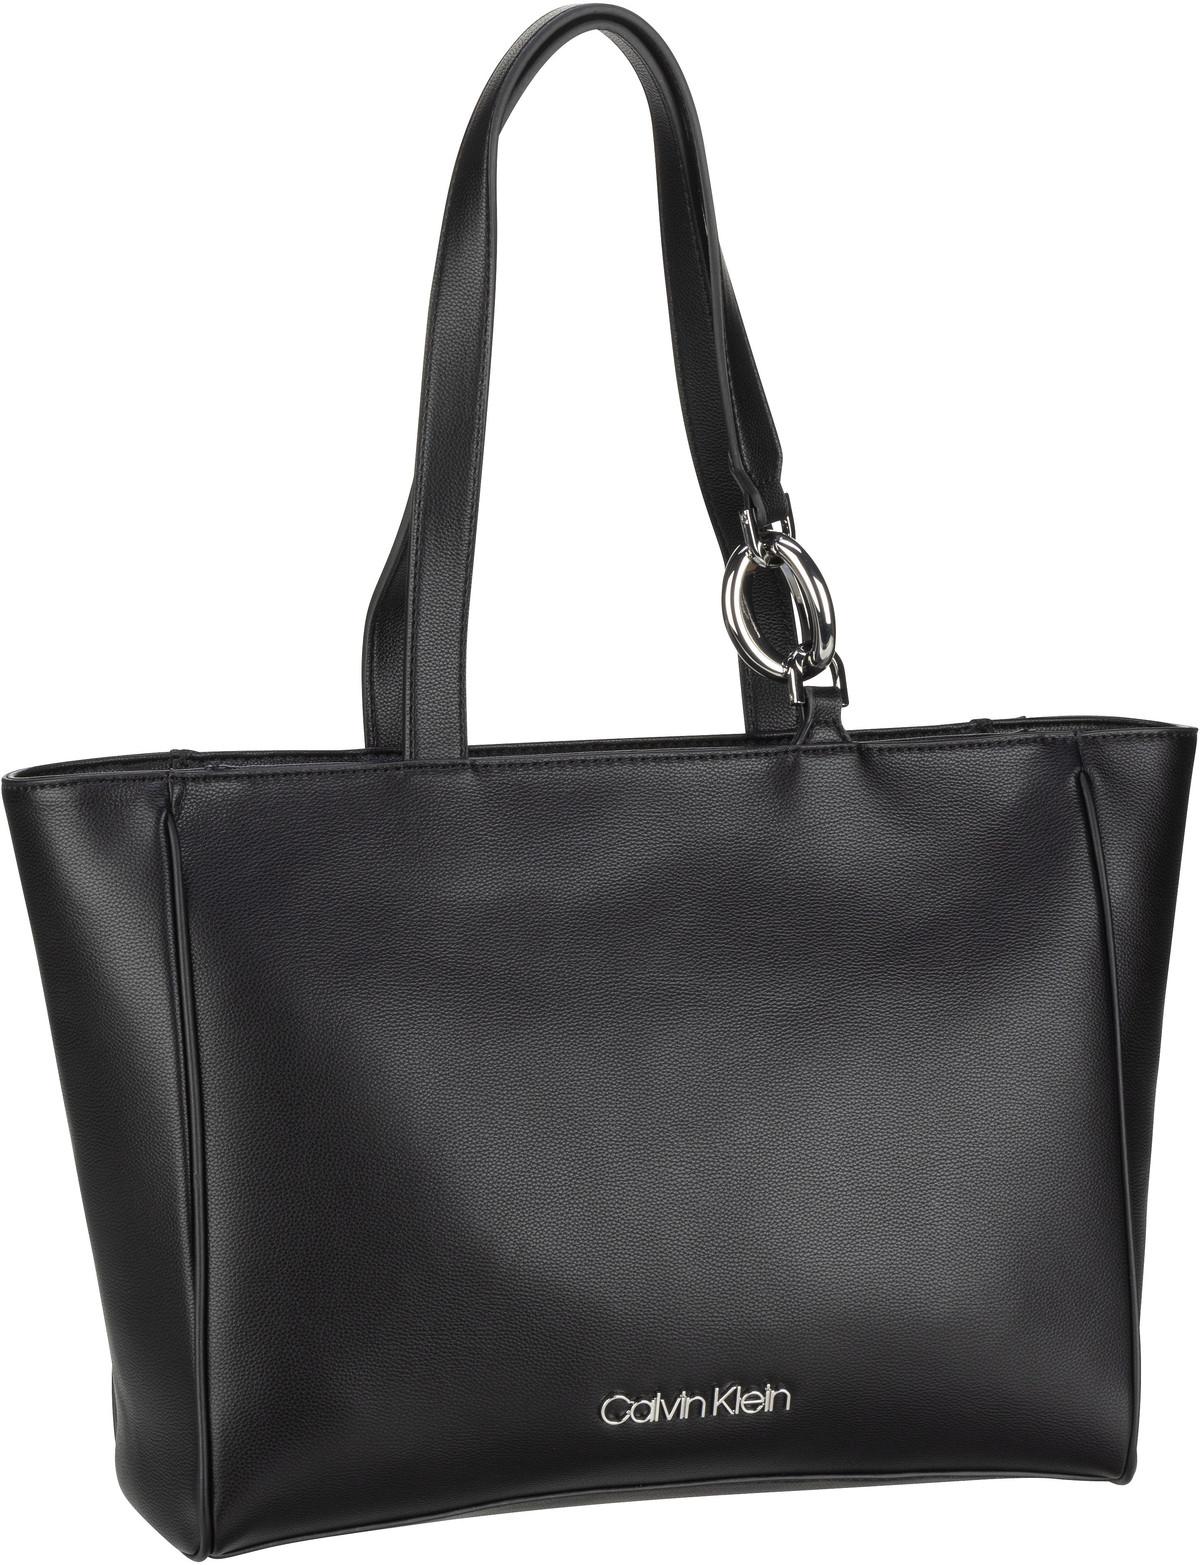 Handtasche CK Chain Shopper PF20 Black